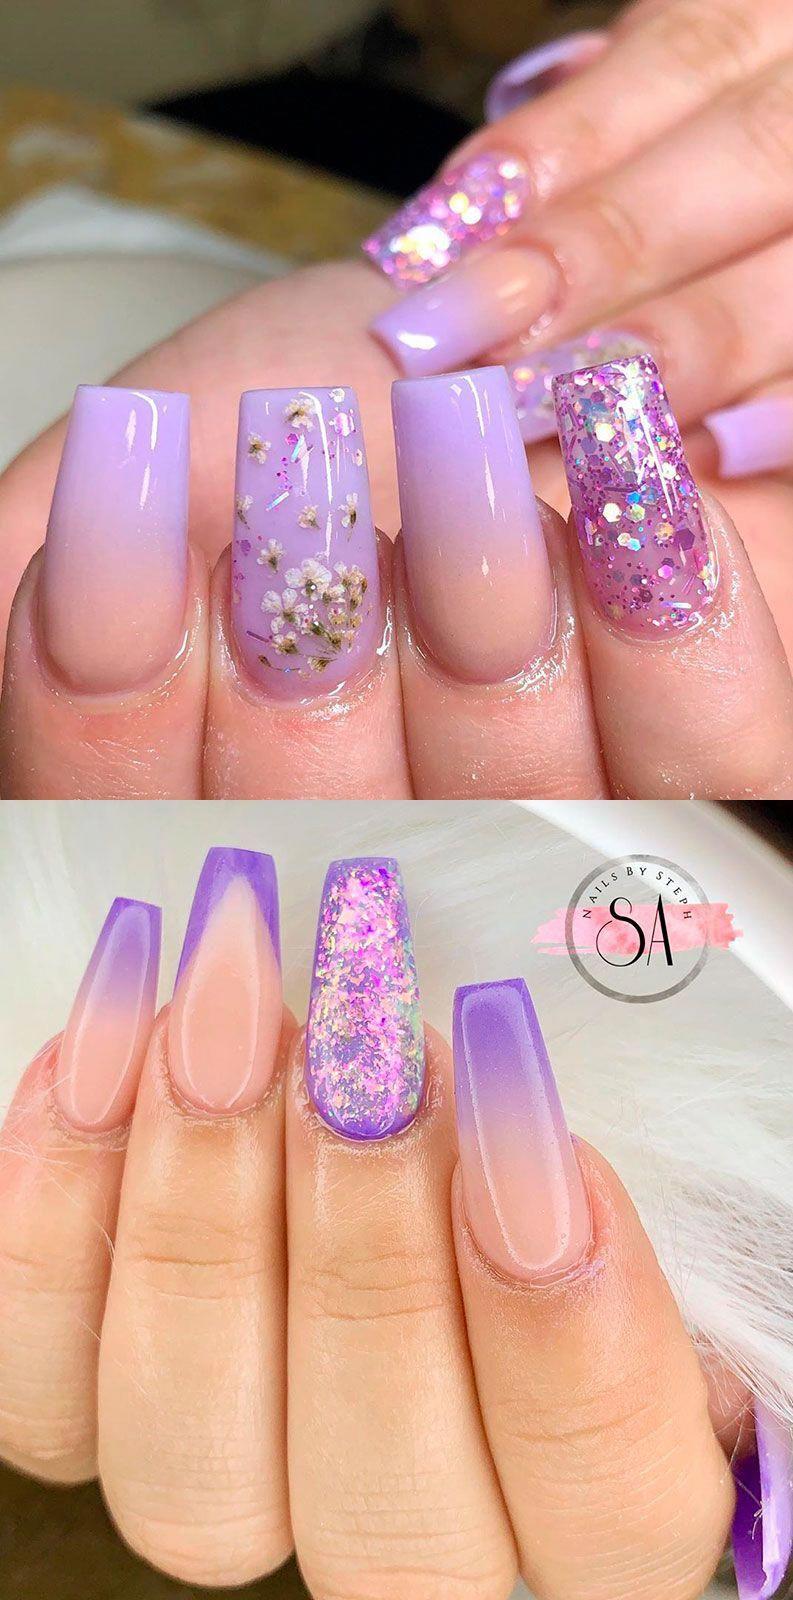 Purple Ombre Nails Ideas For Summer 2019 Ombrenails In 2020 Purple Acrylic Nails Purple Ombre Nails Light Purple Nails